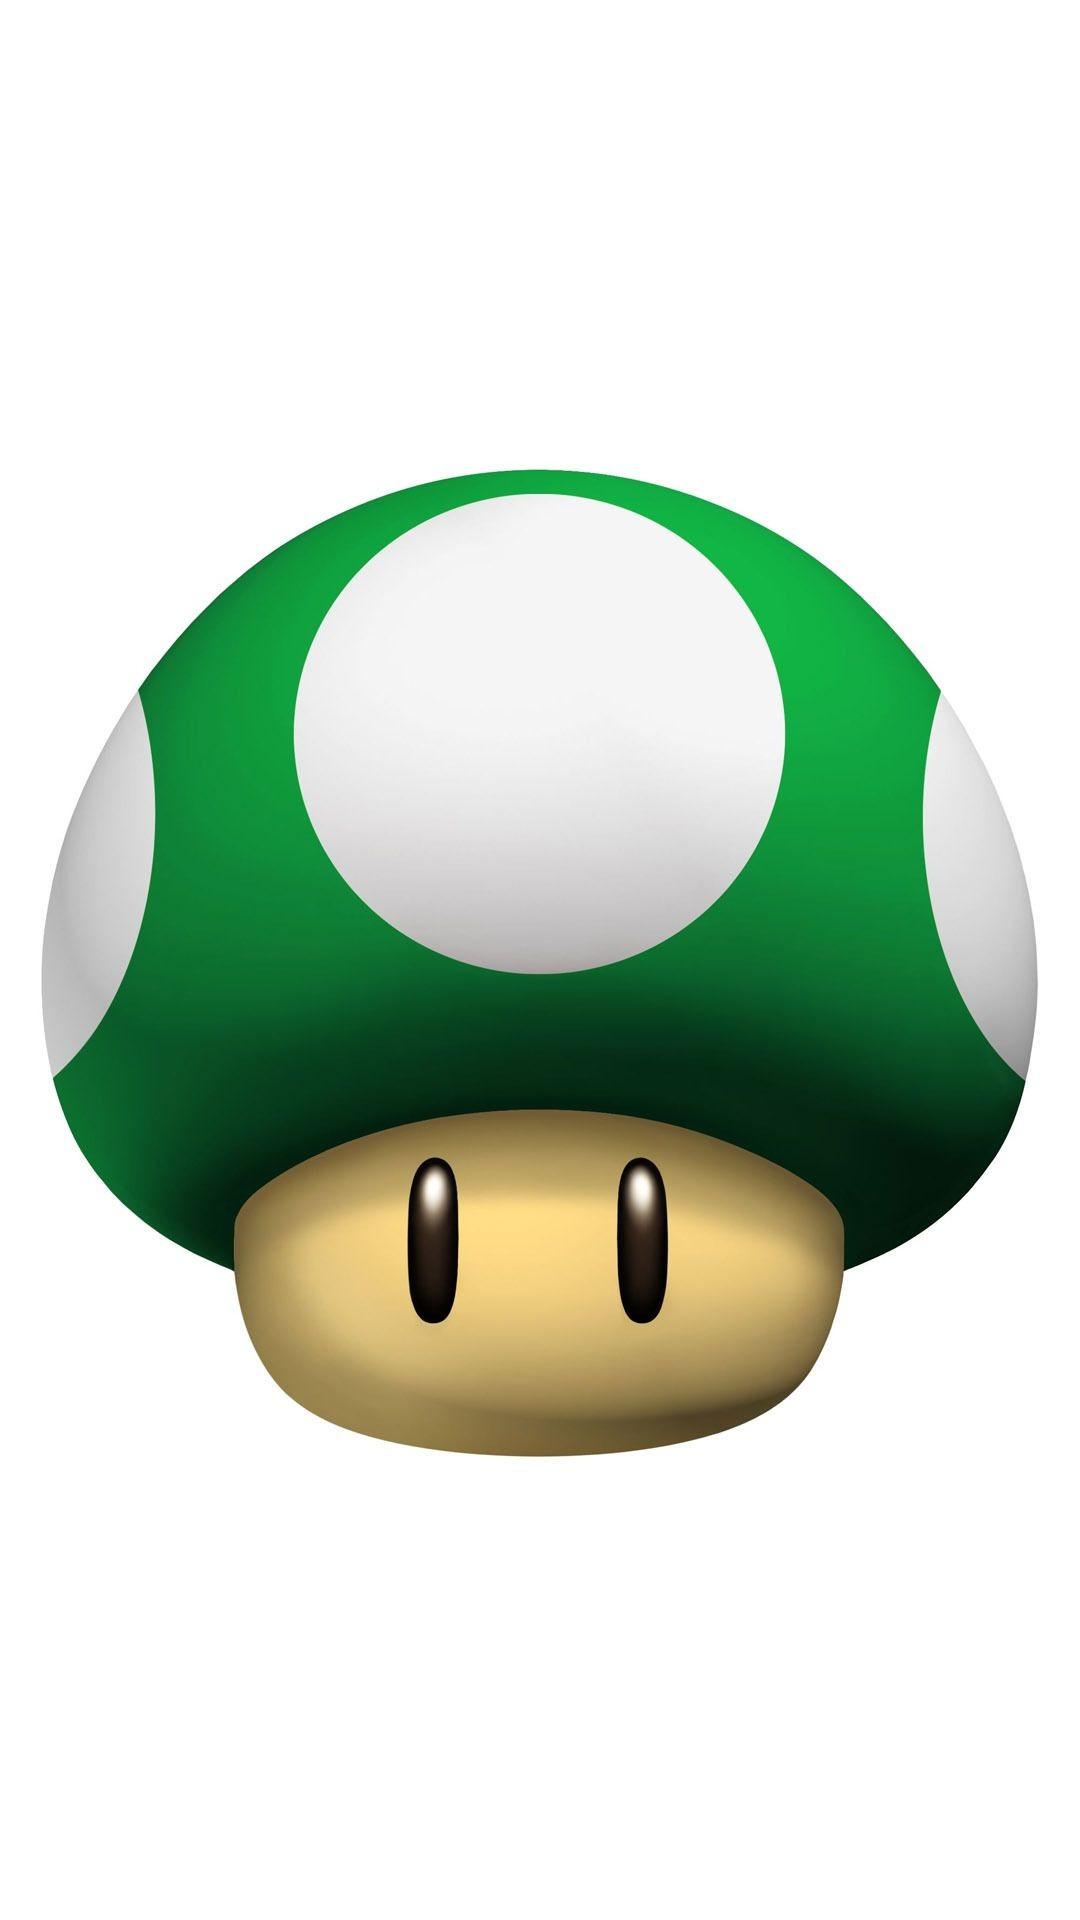 Res: 1080x1920, Small Mushrooms Wallpapers HD Wallpapers Mushrooms Pinterest